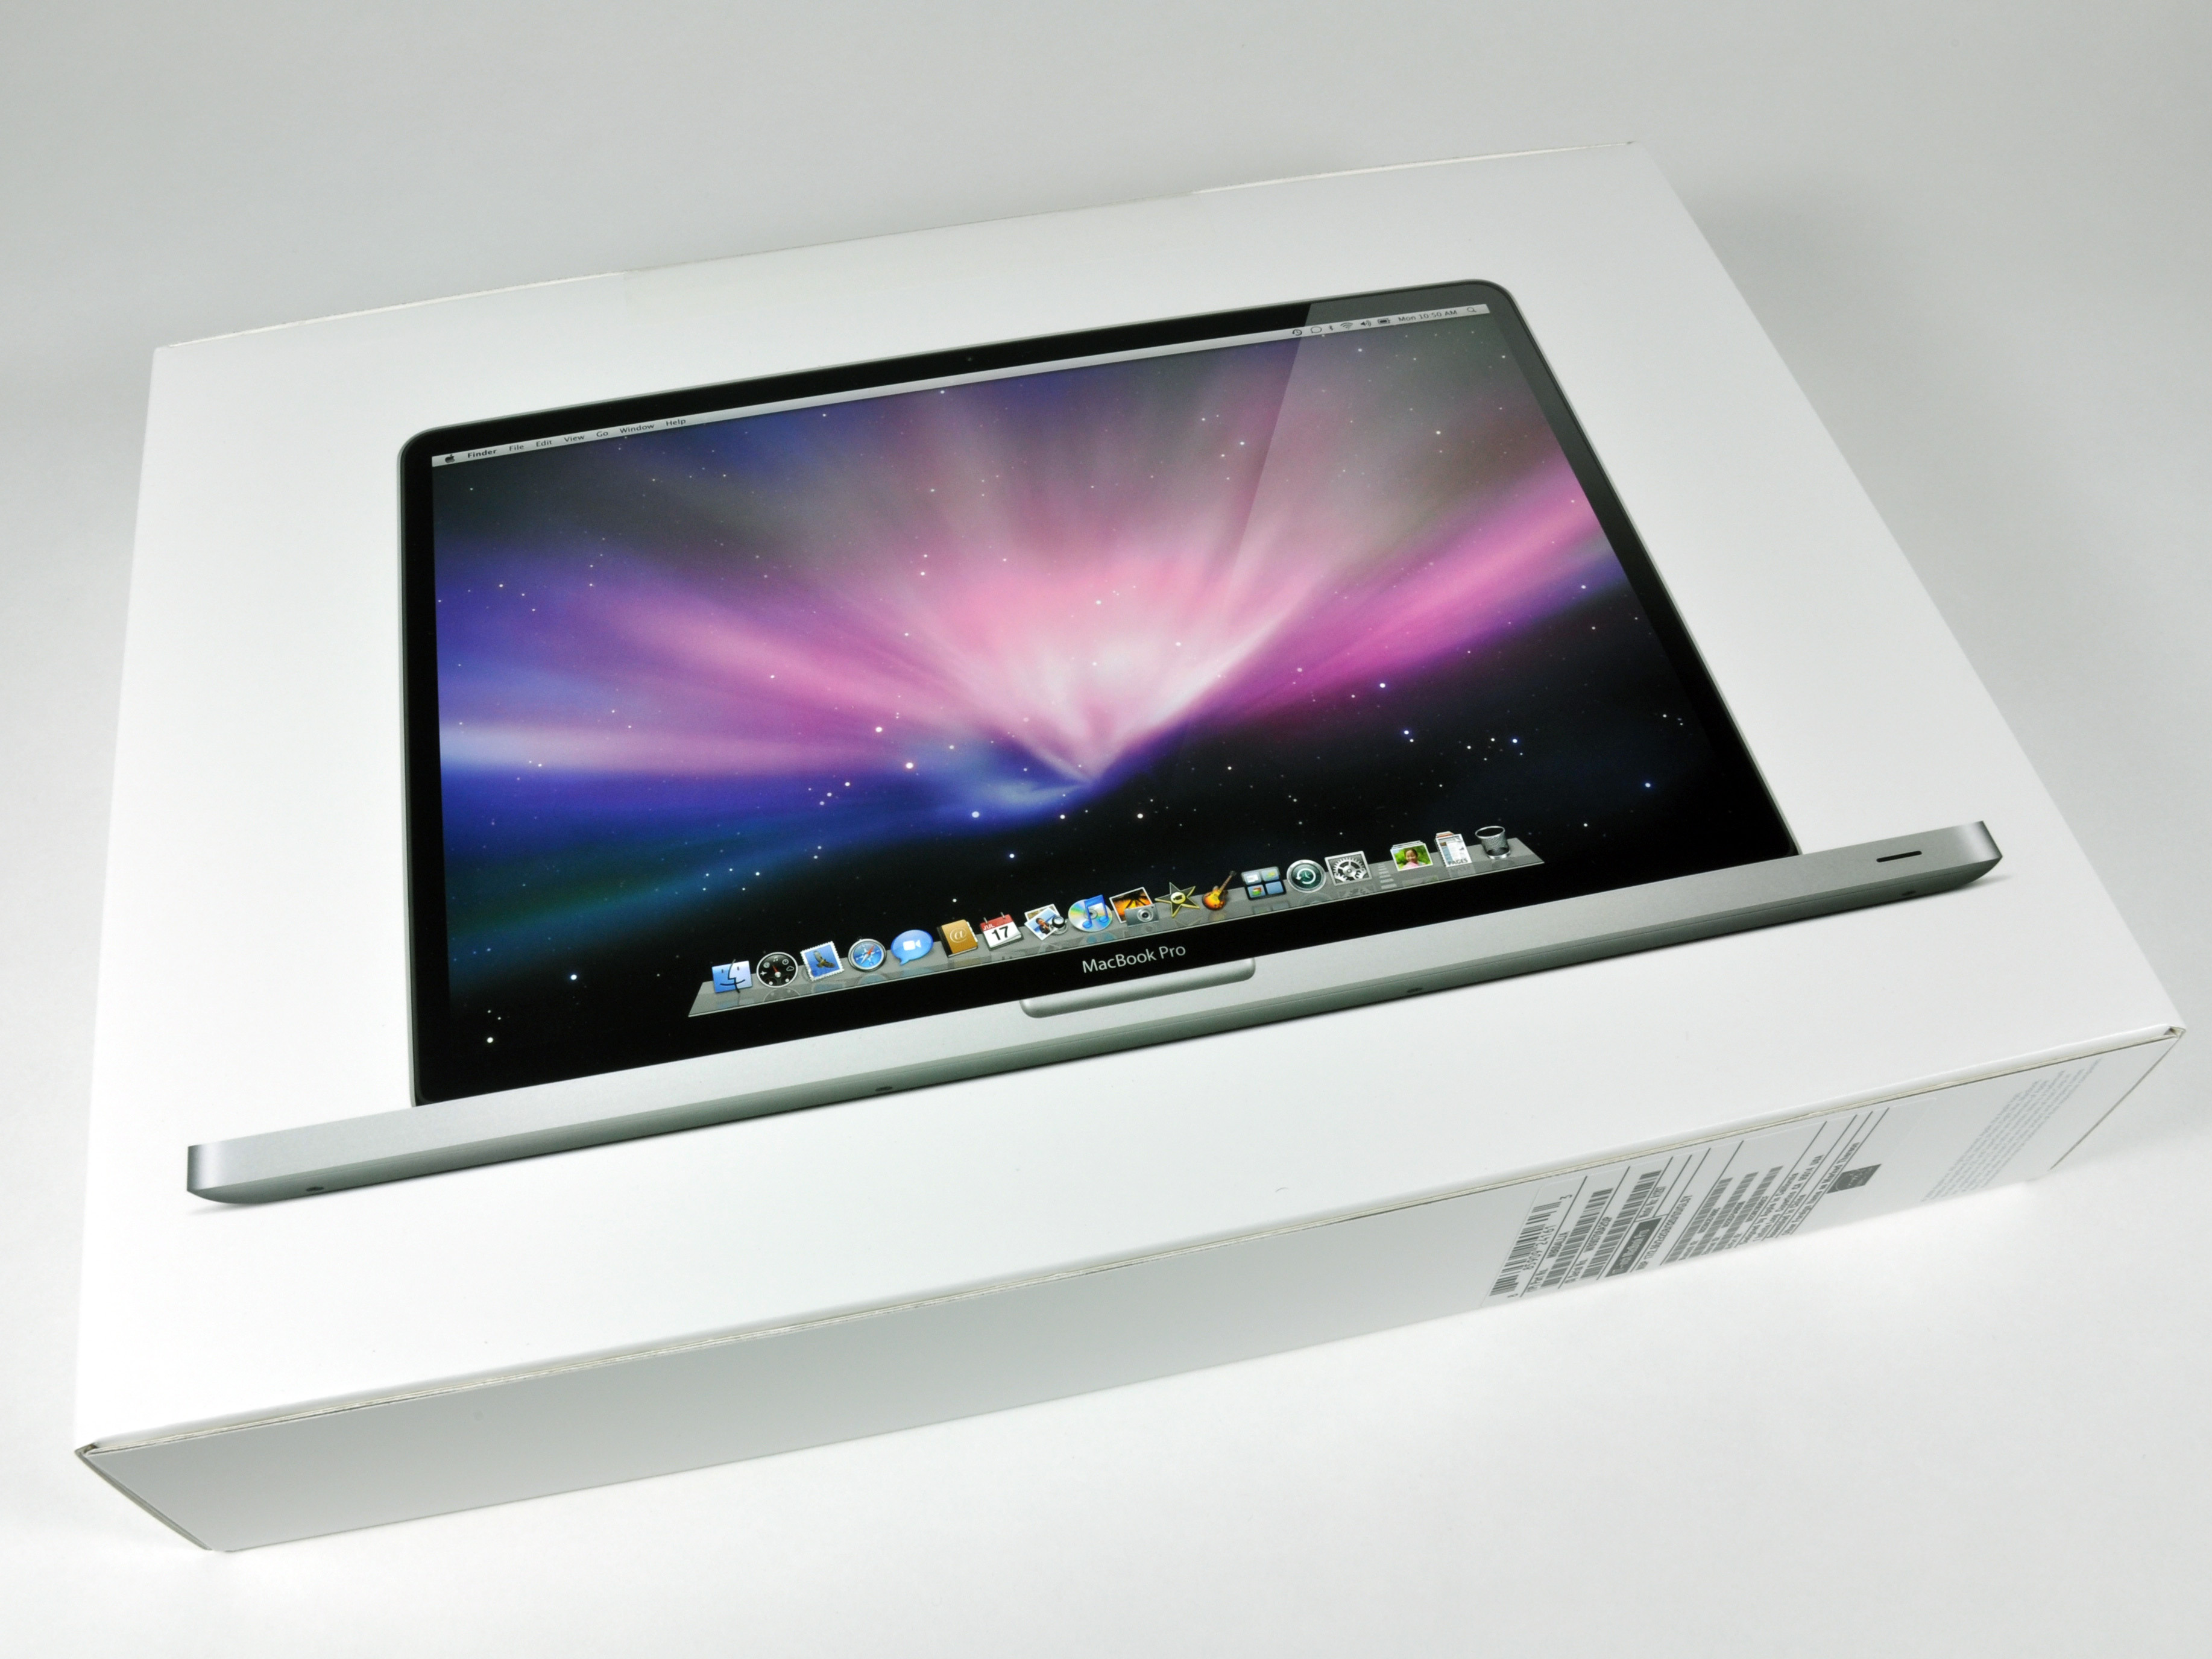 macbook pro 17 unibody teardown ifixit rh ifixit com MacBook Pro 15 Inch 2014 MacBook Pro 15 Inch 2014